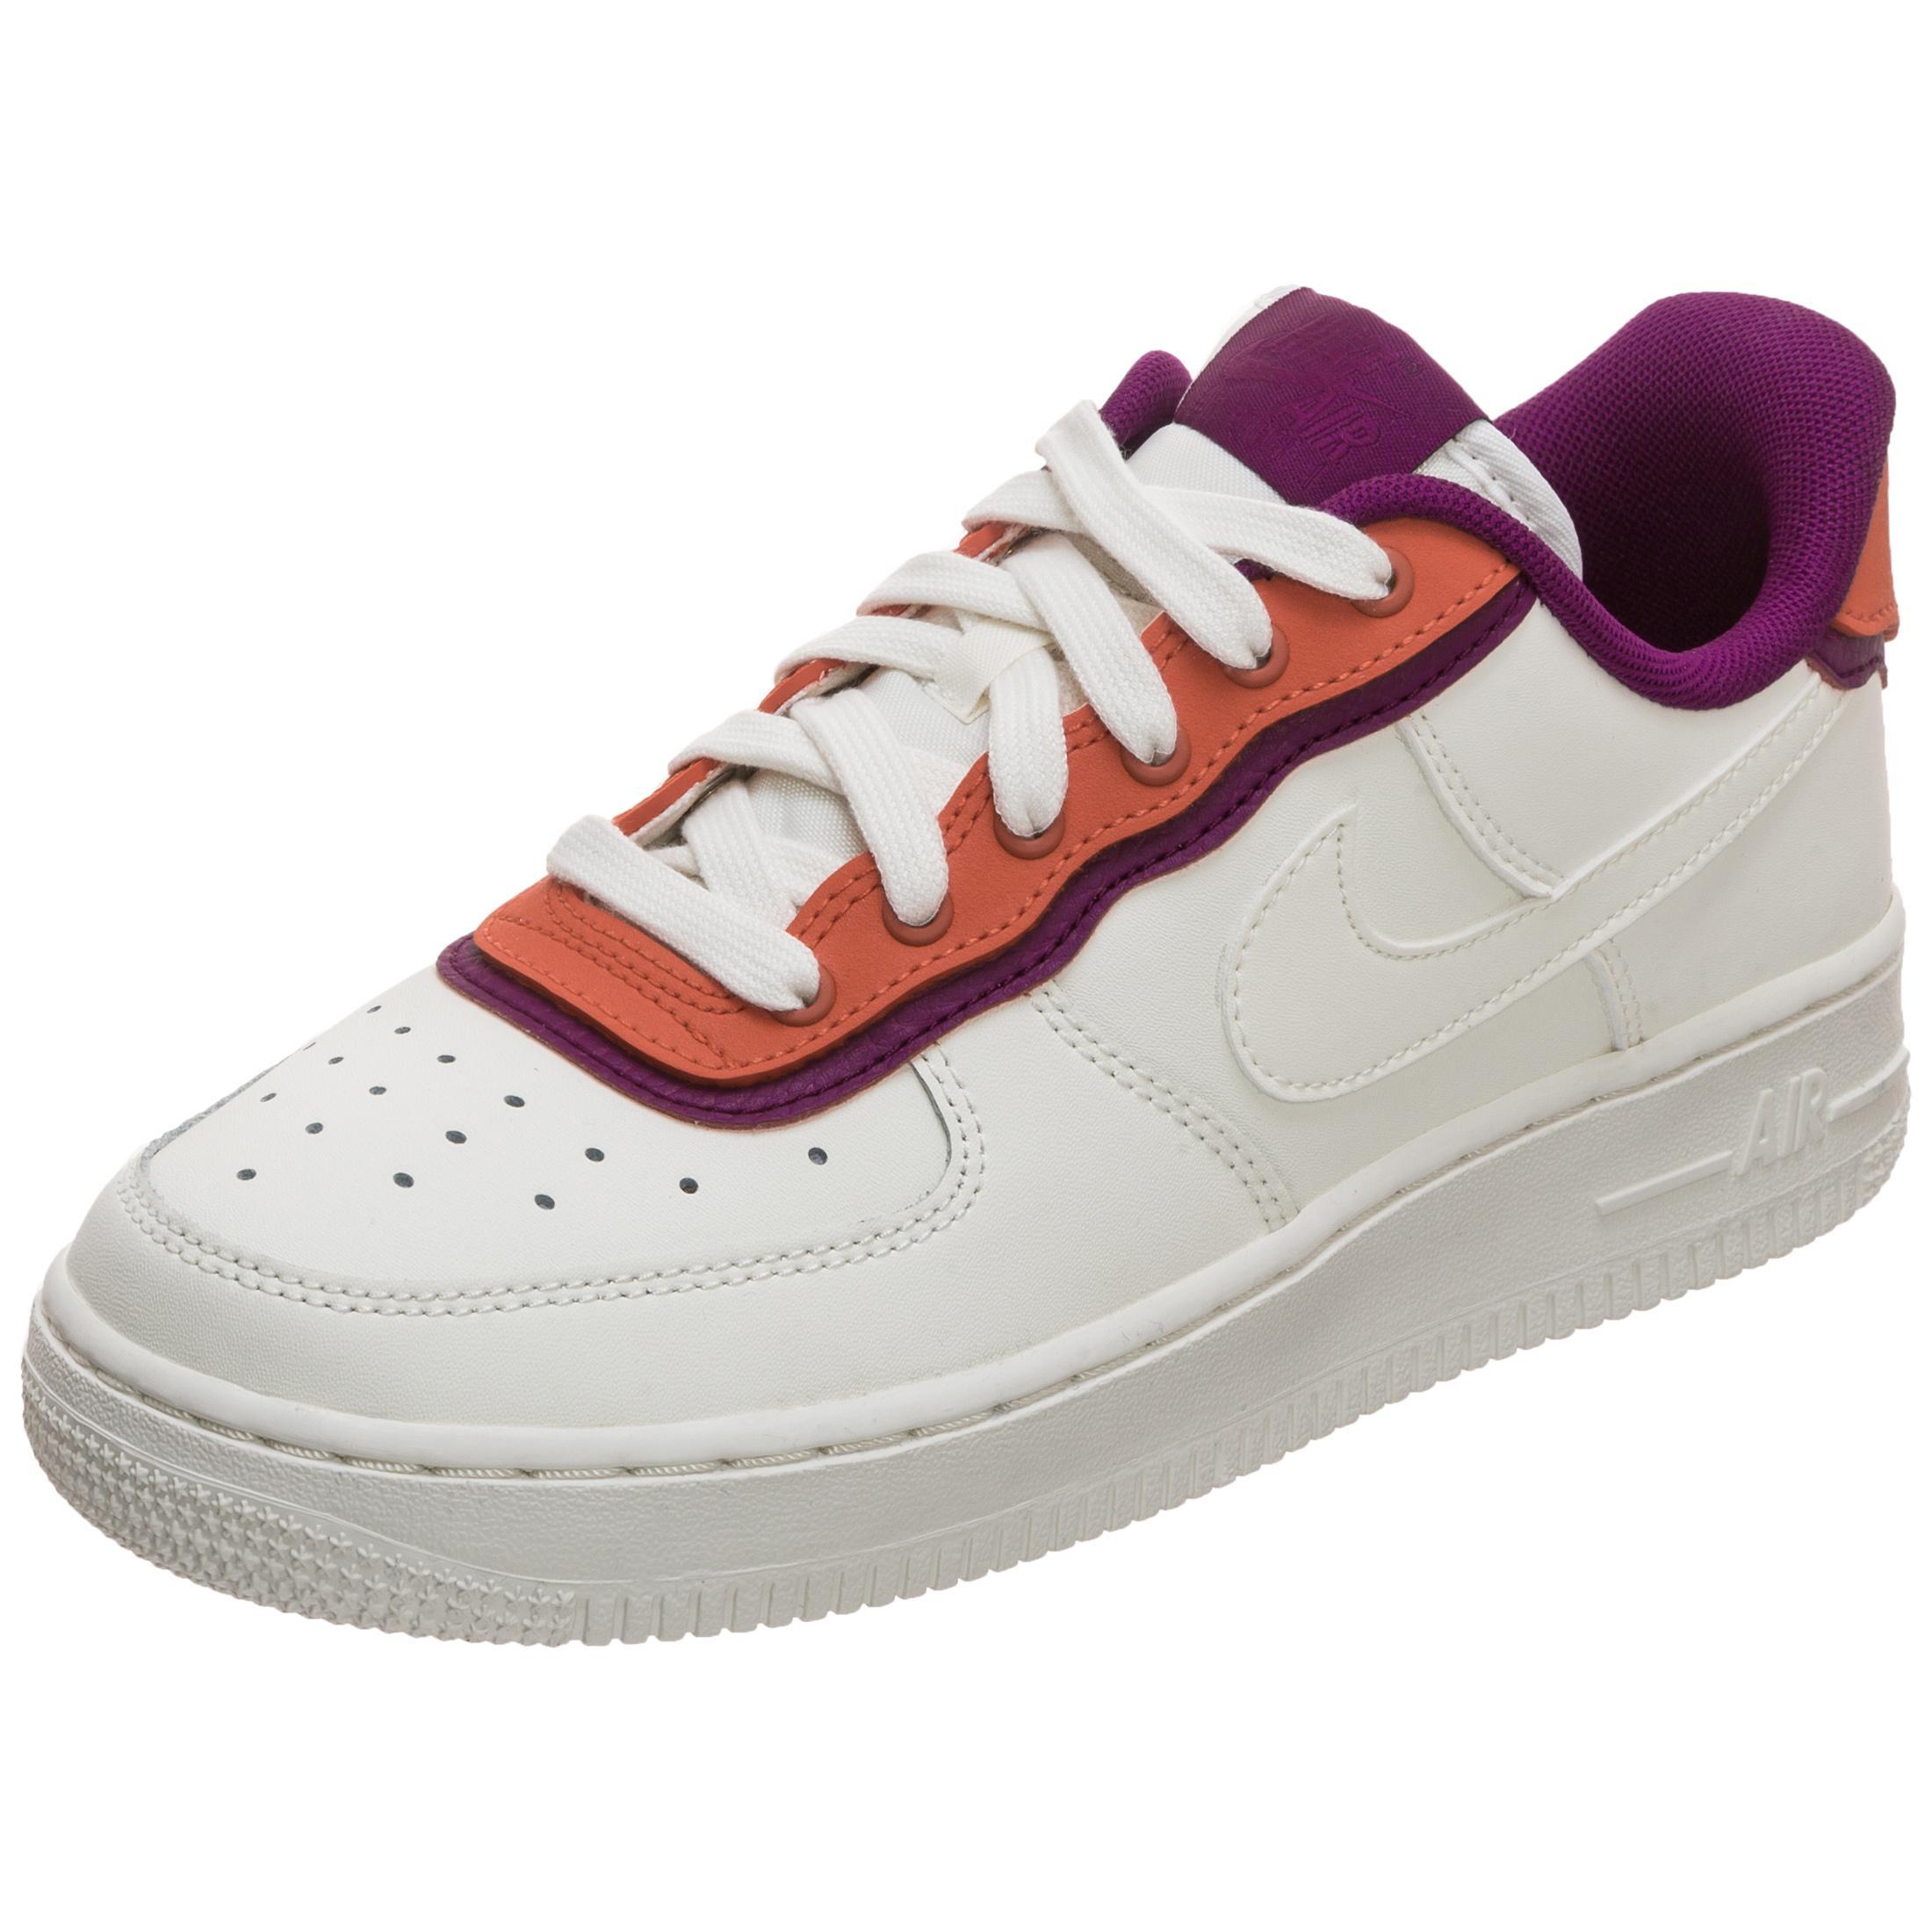 Nike Sportswear, Air Force 1 '07 SE Premium Sneaker Damen